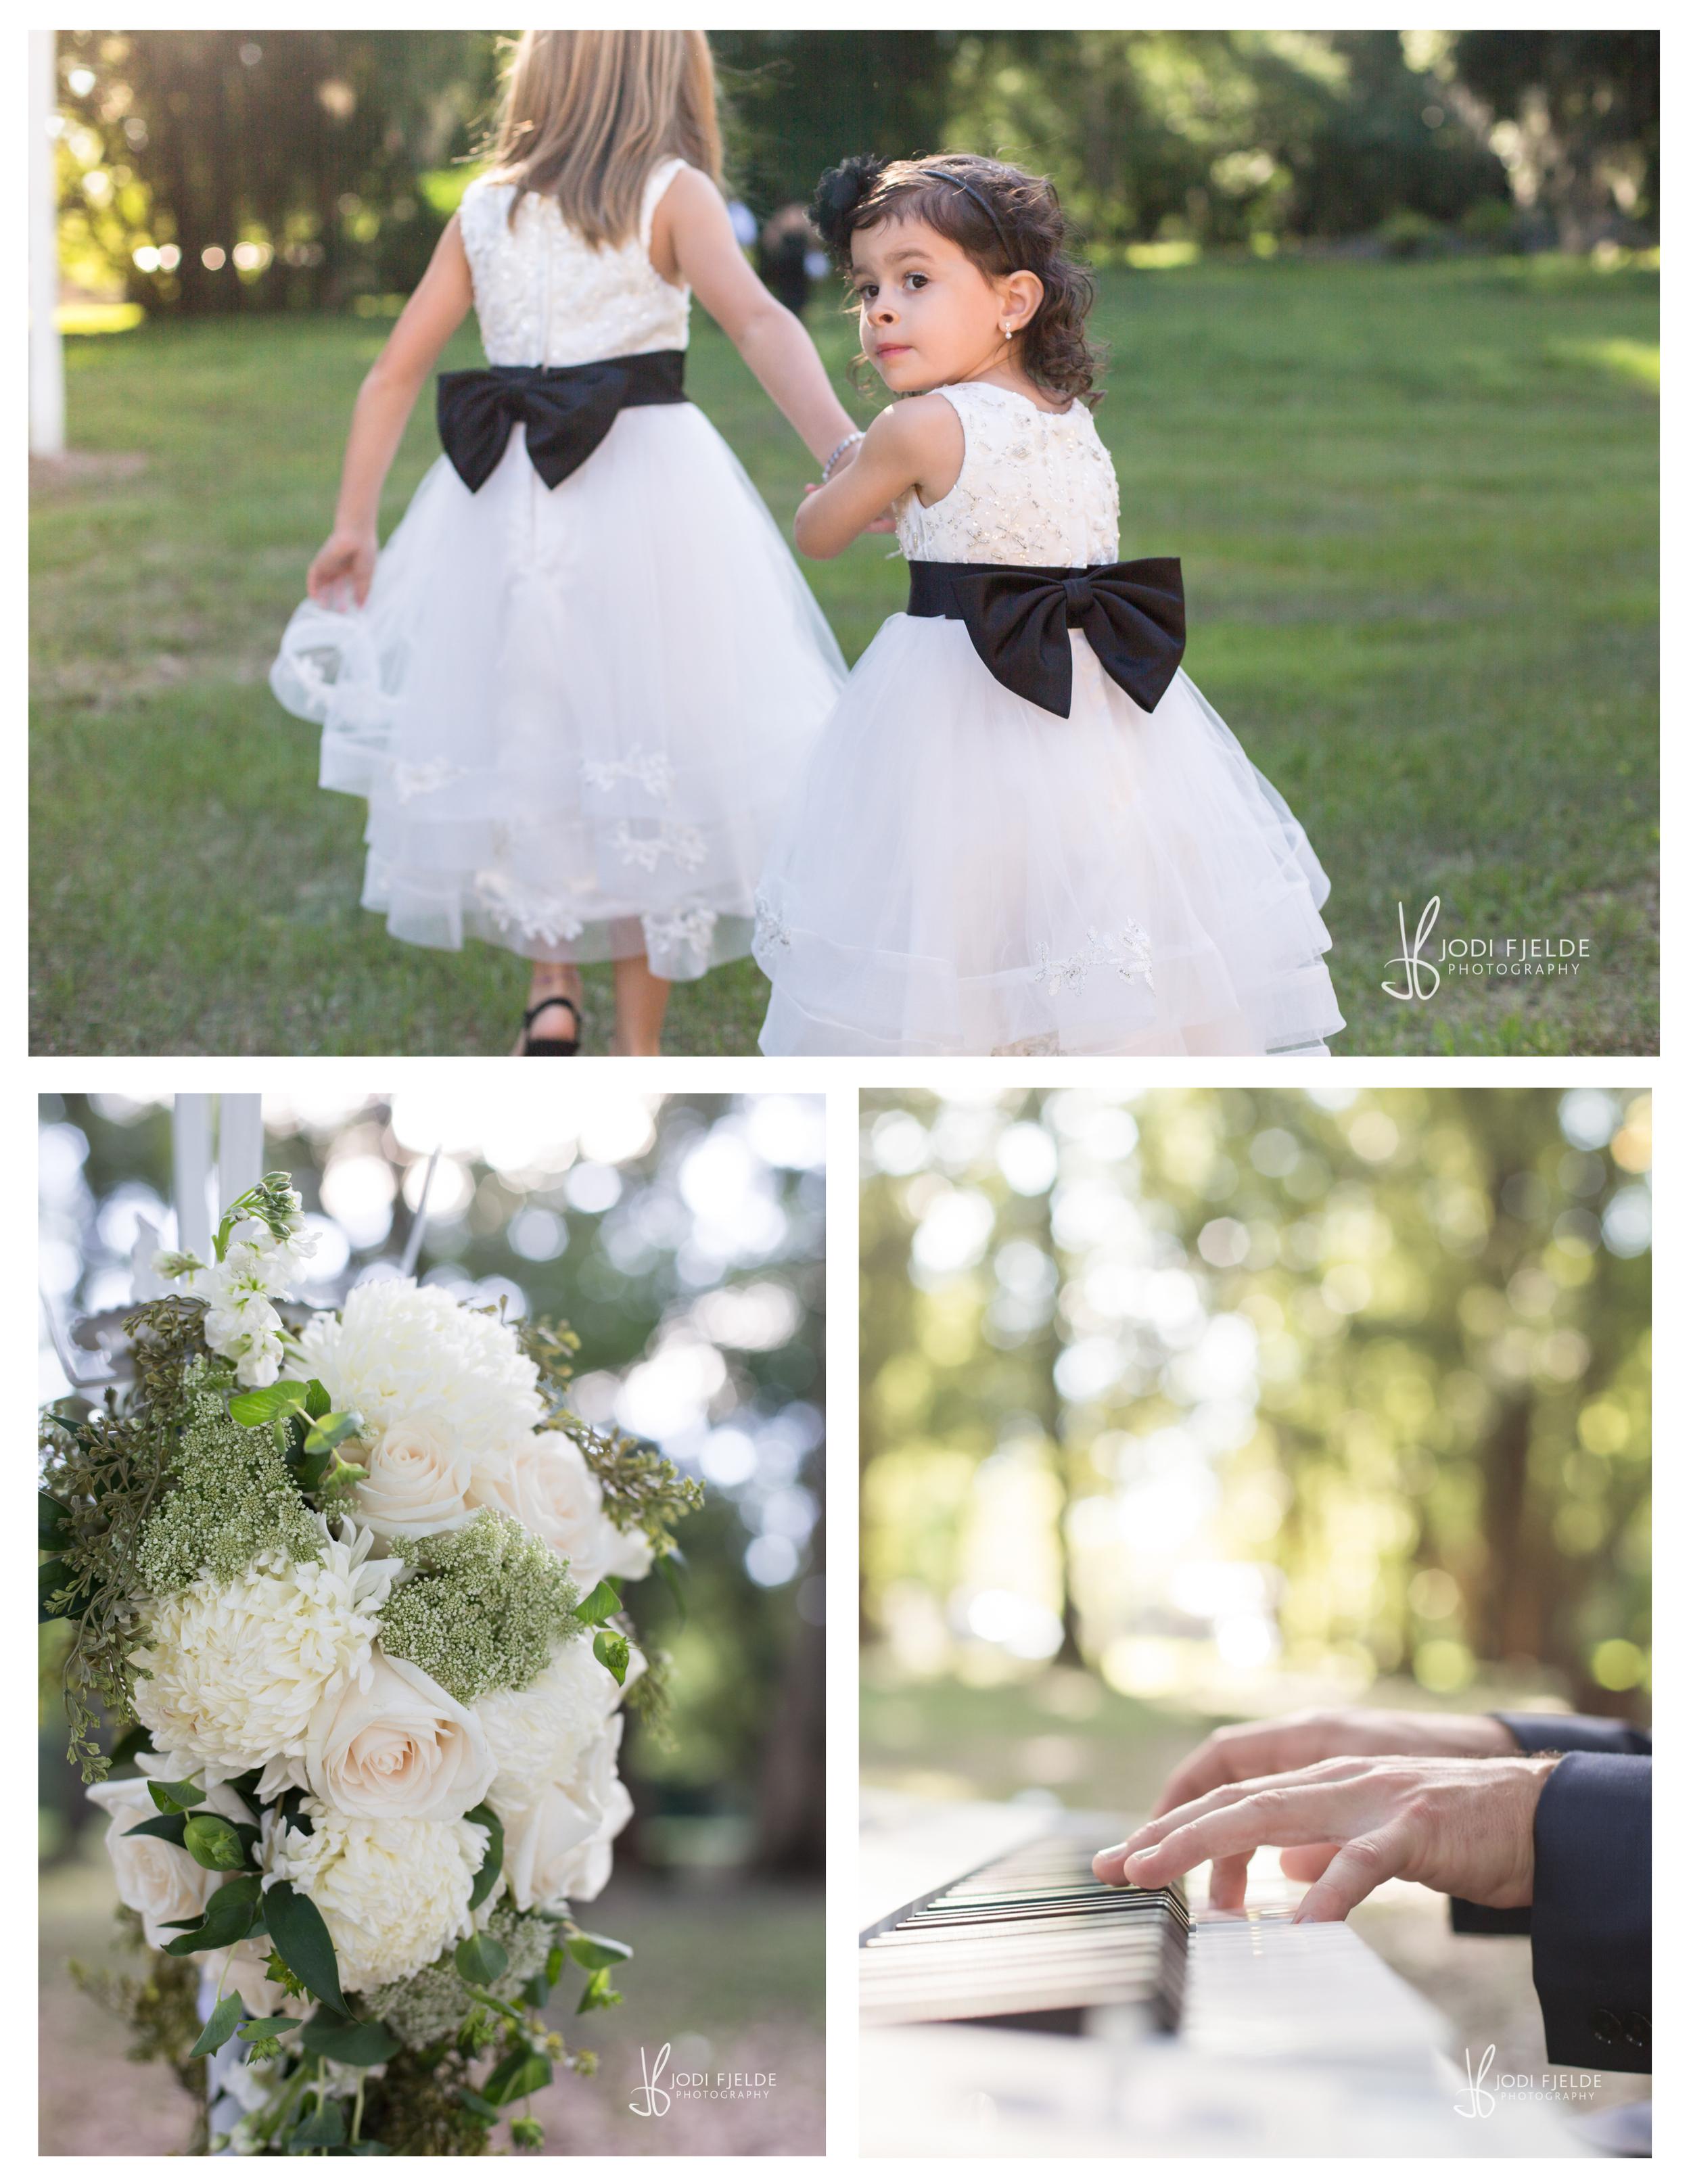 Highland_Manor_Apopka_Florida_wedding_Jackie_&_Tim_photography_jodi_Fjelde_photography-12.jpg